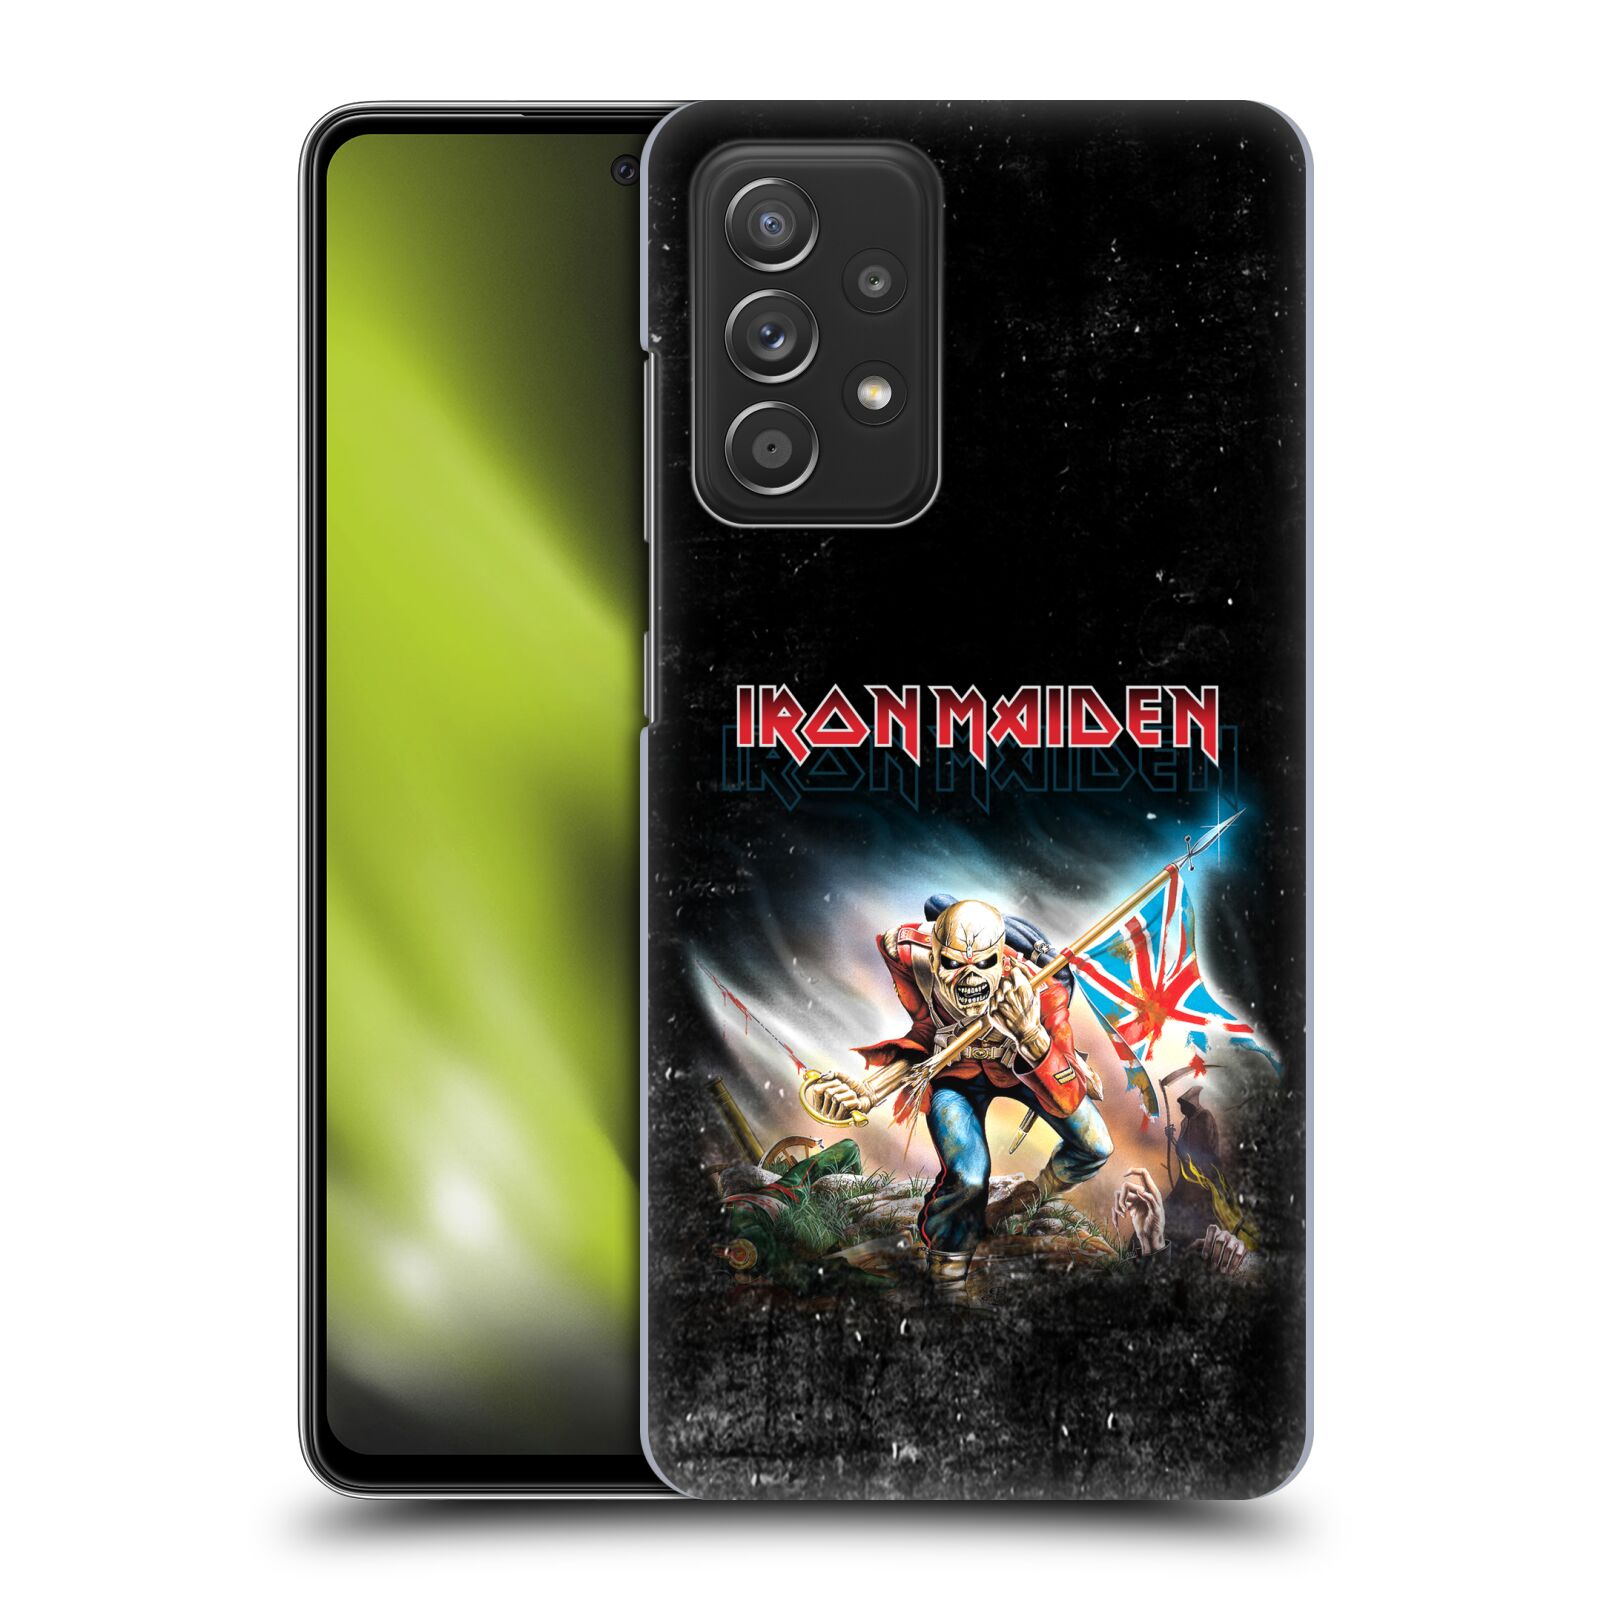 Plastové pouzdro na mobil Samsung Galaxy A52 / A52 5G / A52s 5G - Head Case - Iron Maiden - Trooper 2016